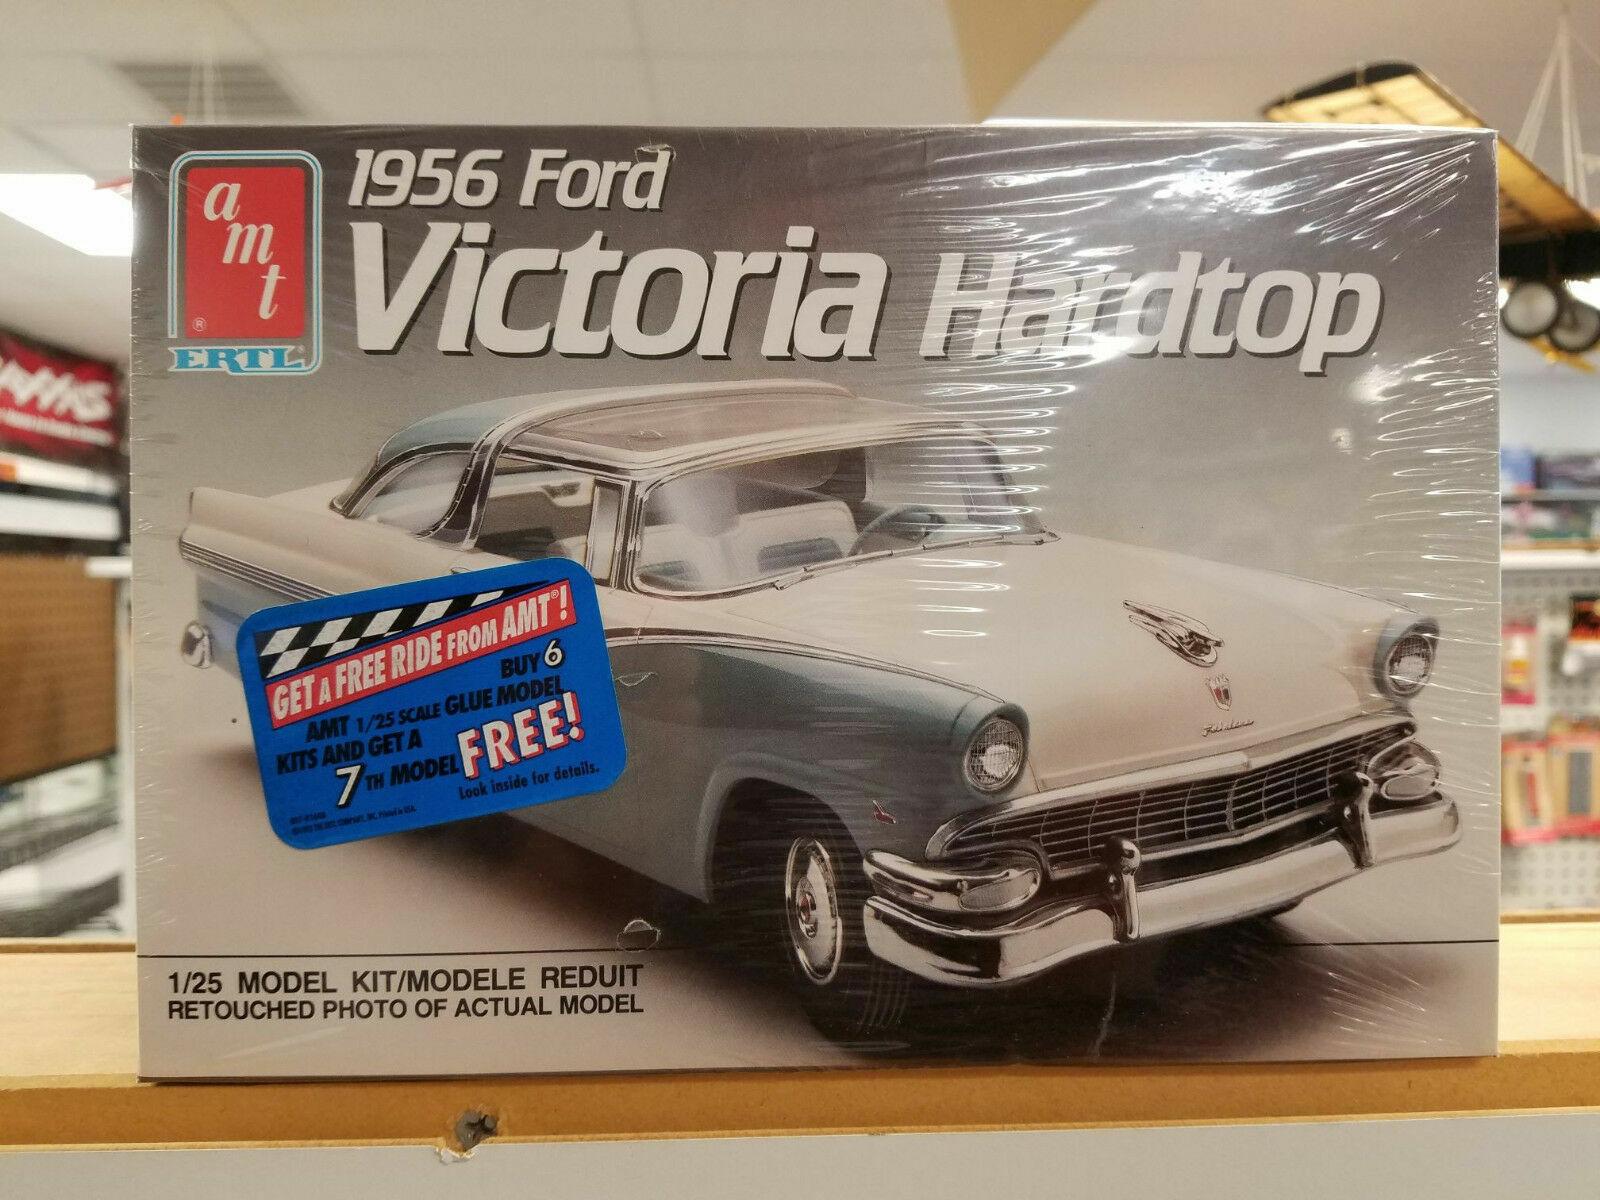 1966 Ford Mustang Hardtop Classic Car AMT ERTL Plastic Model Kit Scale 1 25